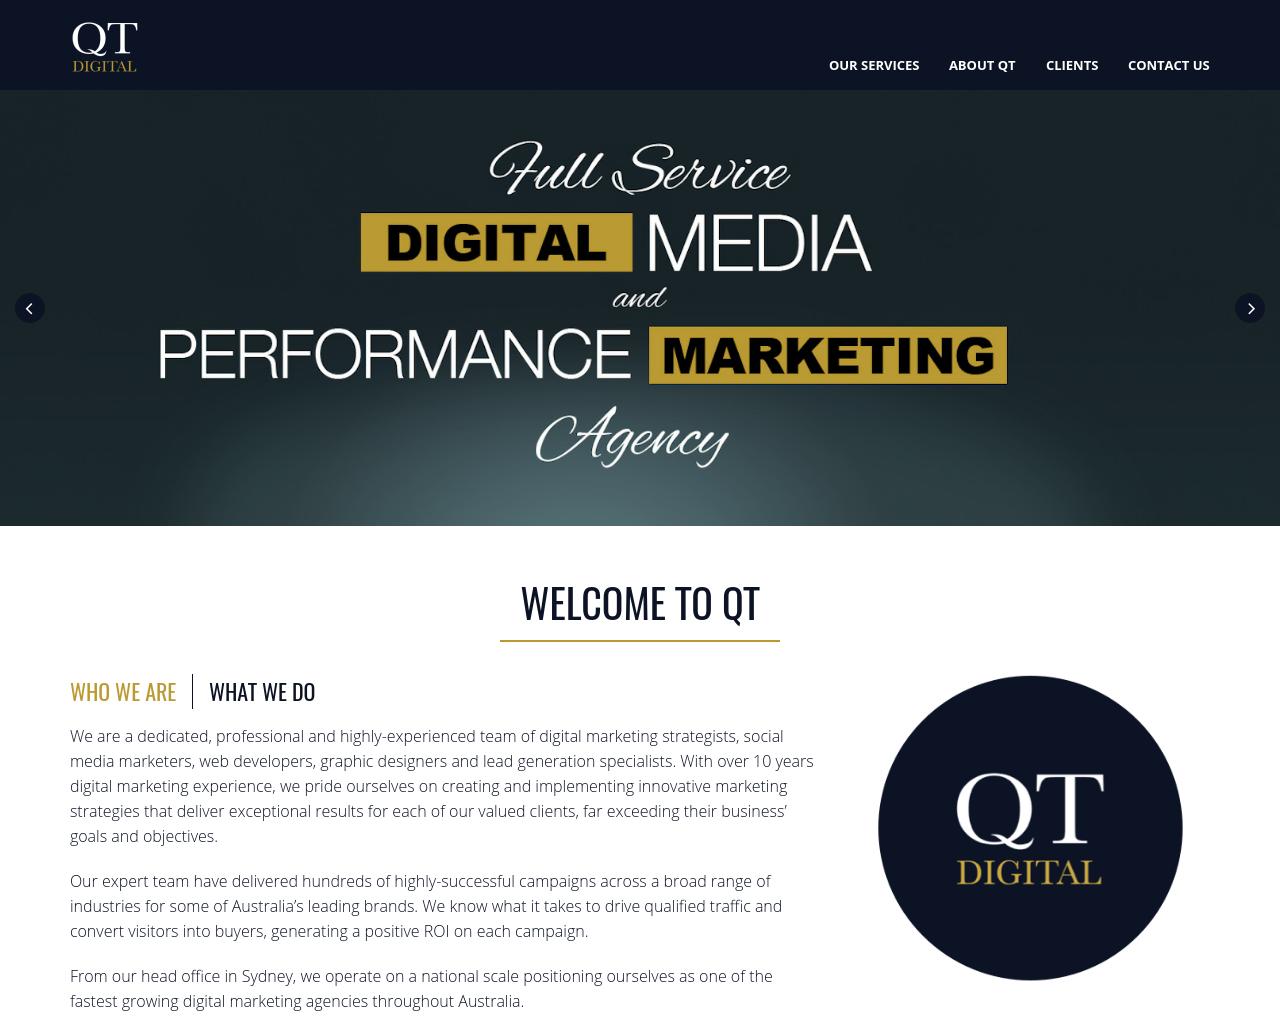 QT-Digital-Advertising-Reviews-Pricing